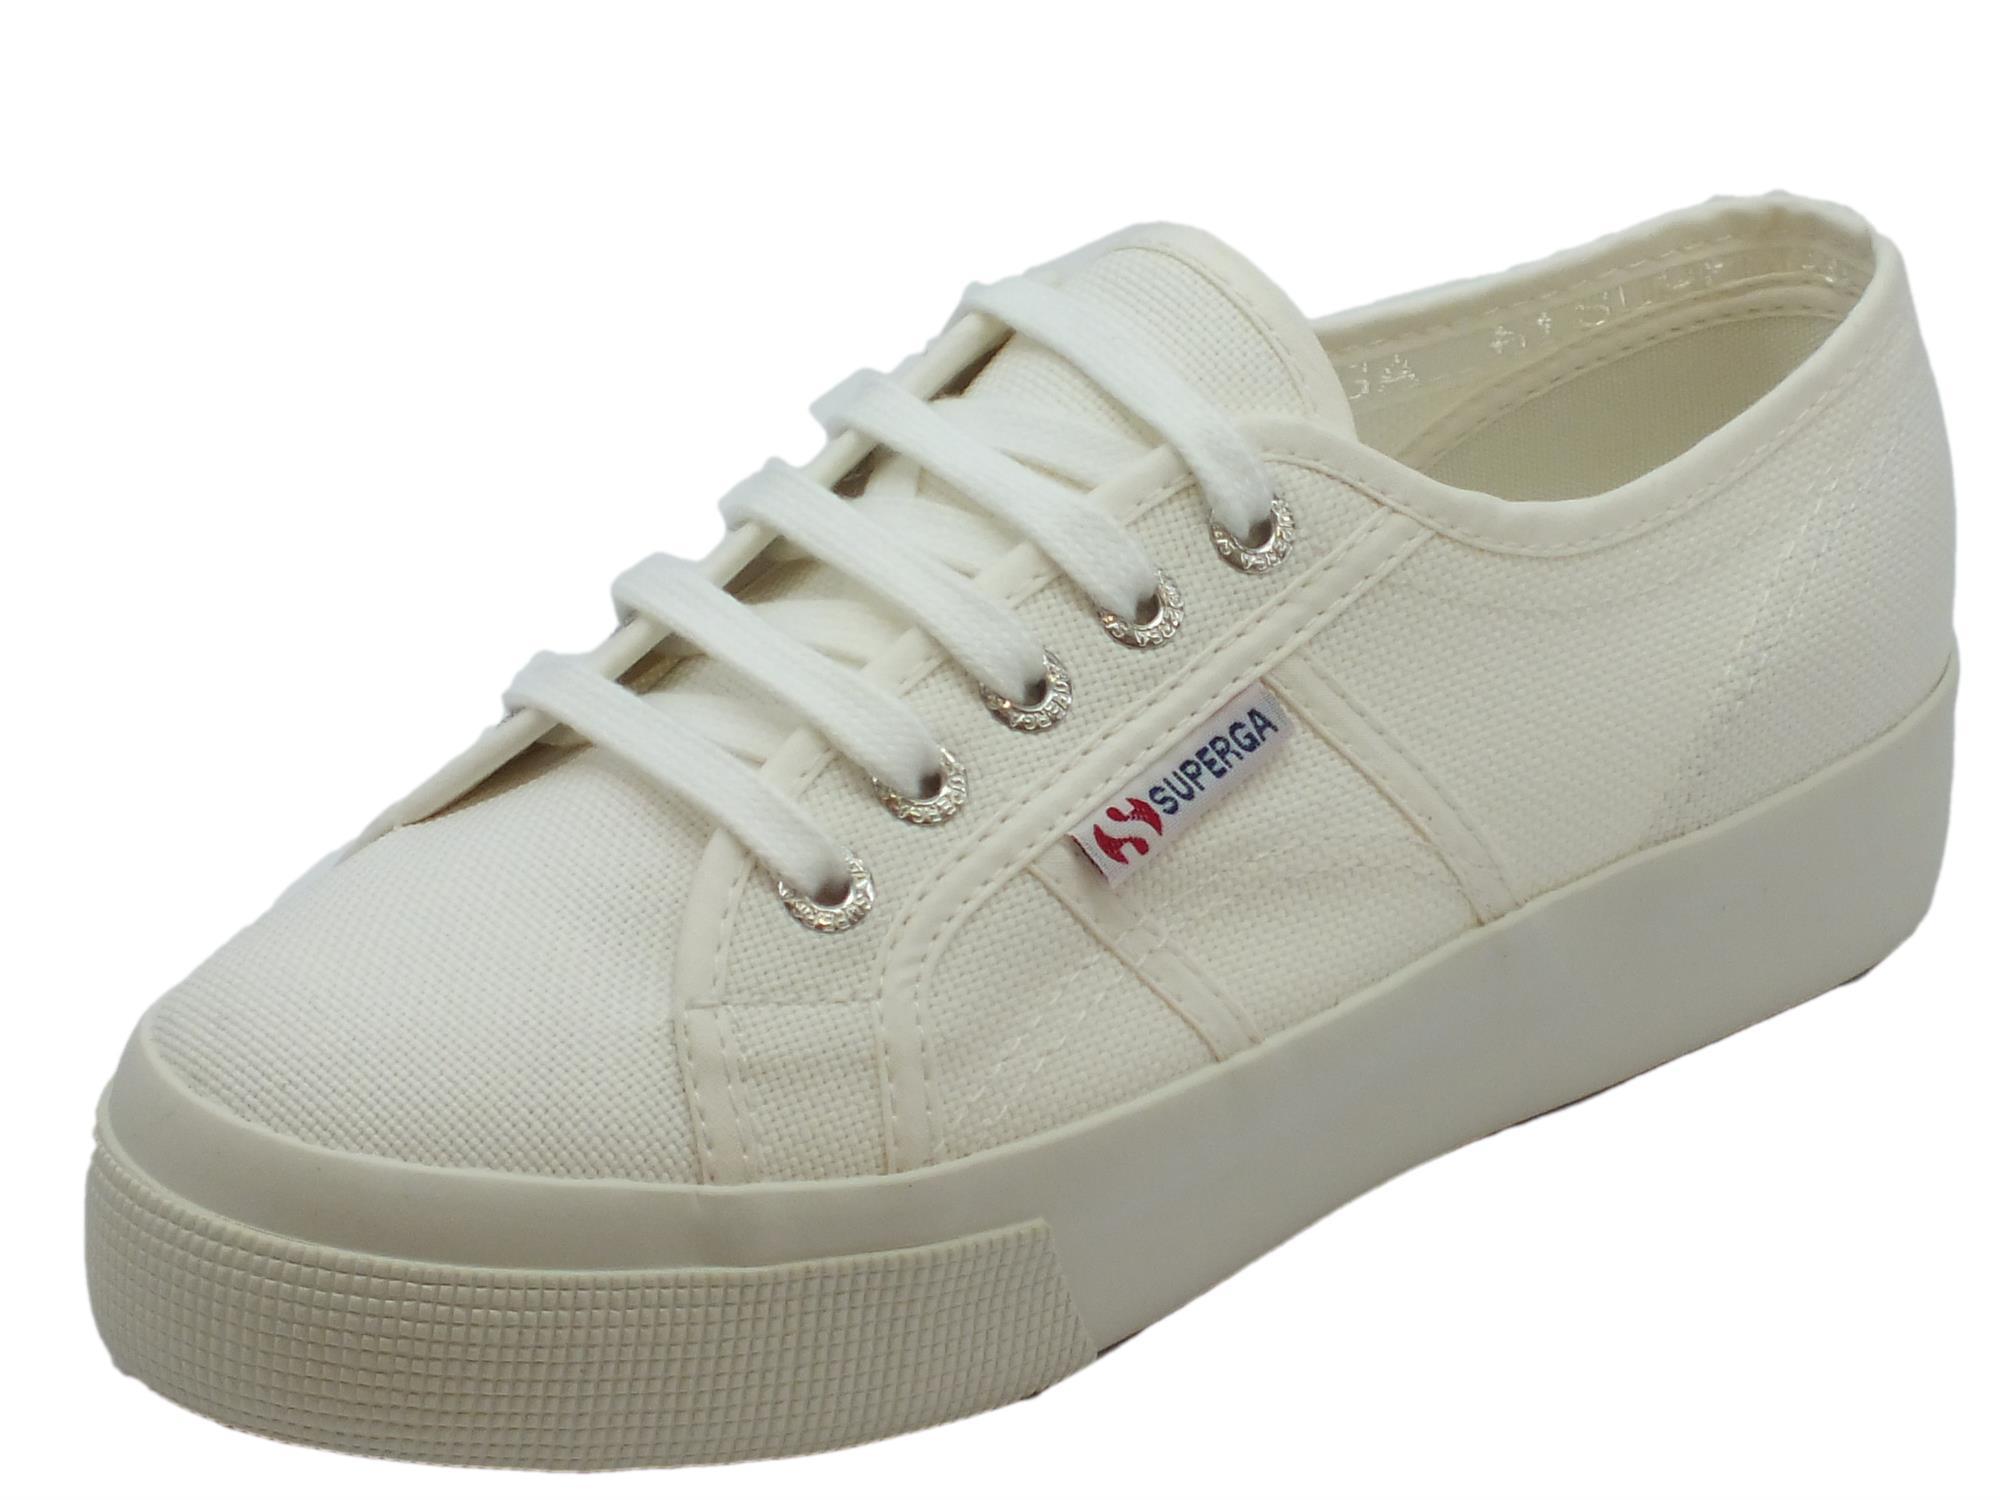 Scarpe sportive Superga donna tessuto bianco zeppa media - Vitiello ... 93c0c1245d8